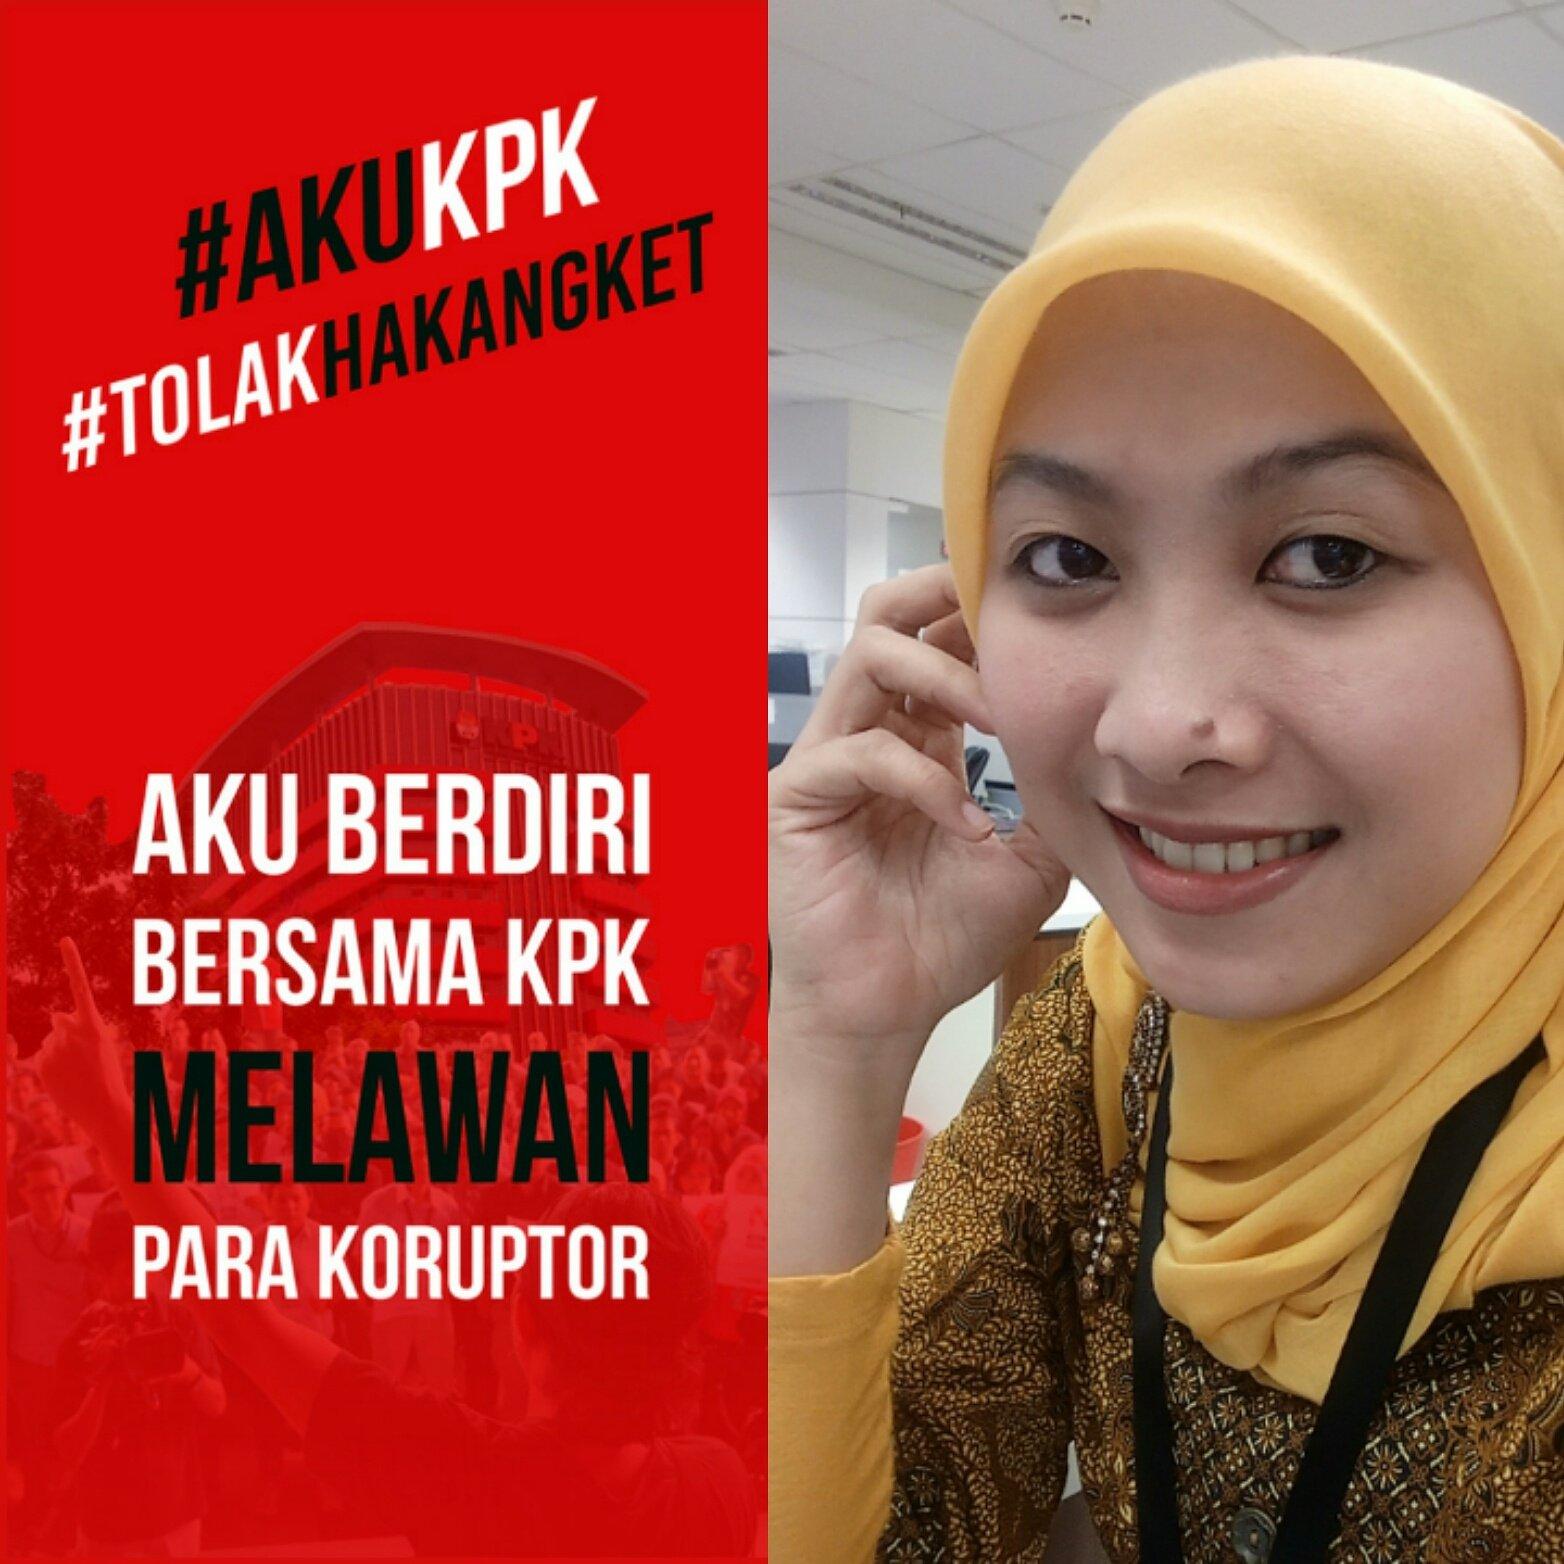 "tata khoiriyah on Twitter: ""I stand with KPK. #akuKPK #TolakHakAngket… """